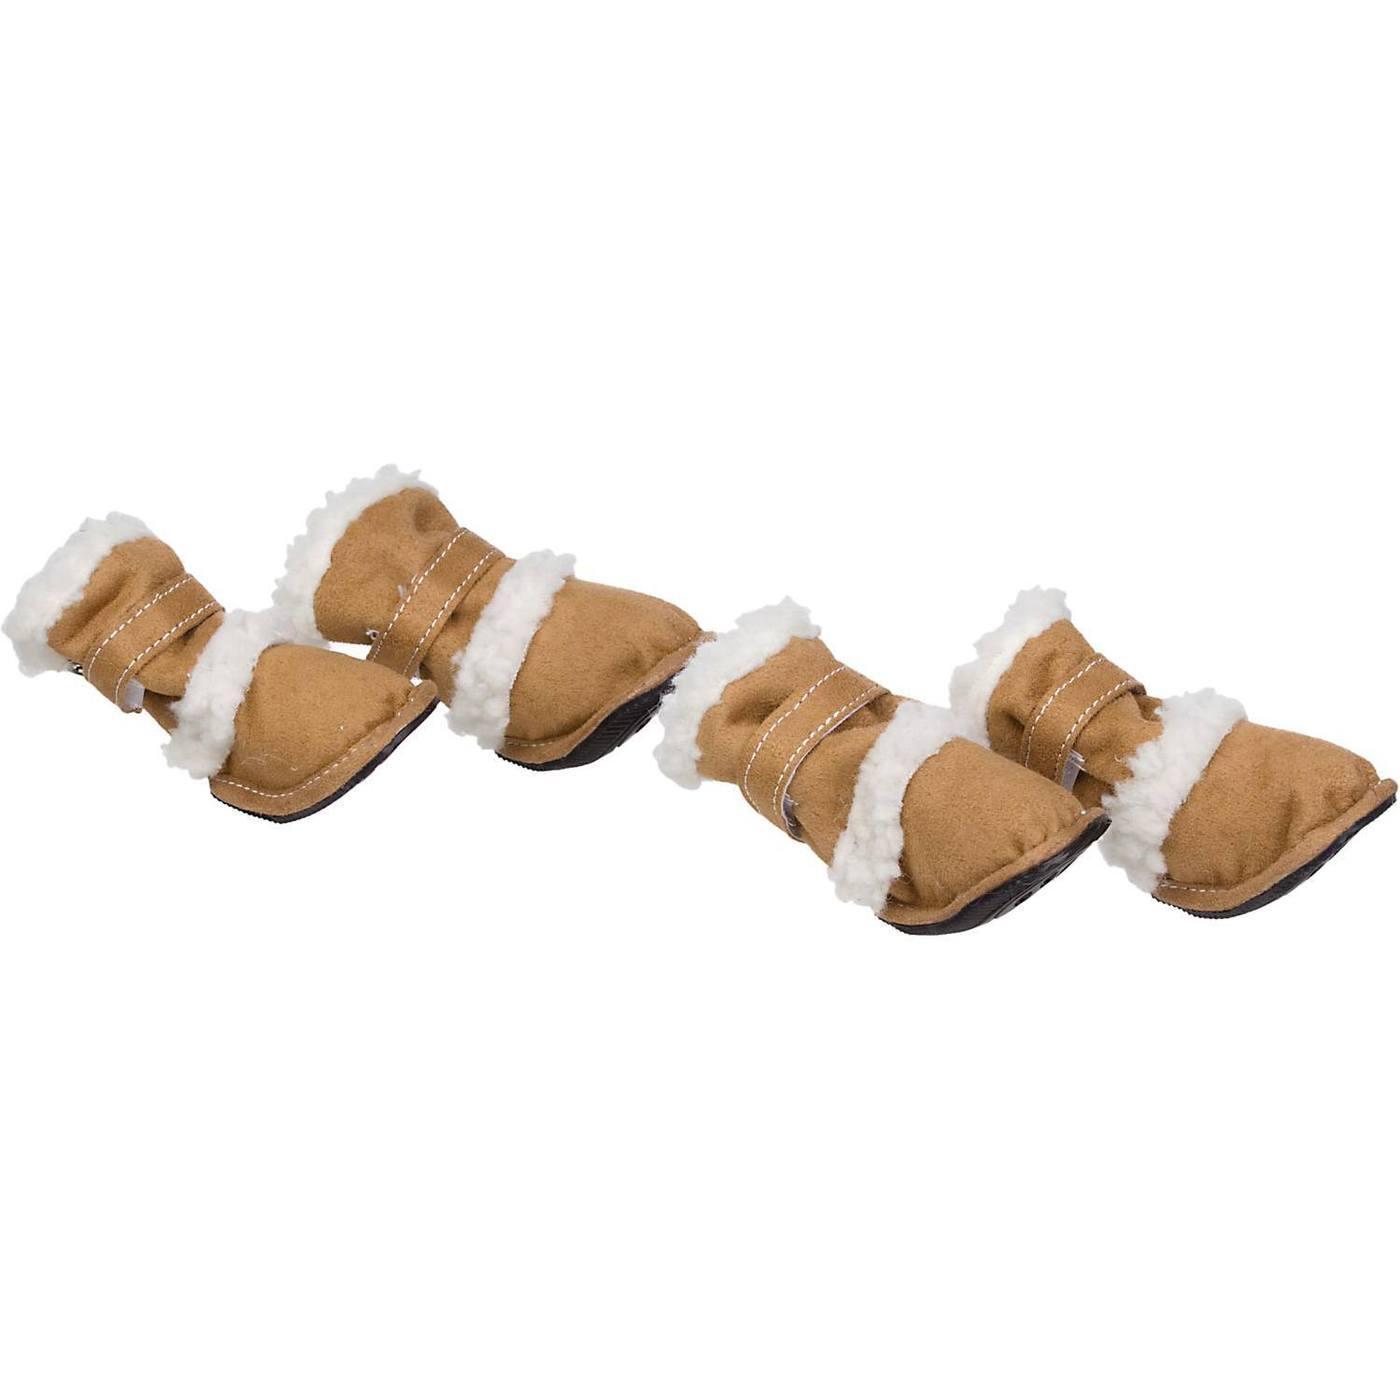 Pet Life 'Duggz' 3M Insulated Winter Fashion Dog Booties - Tan